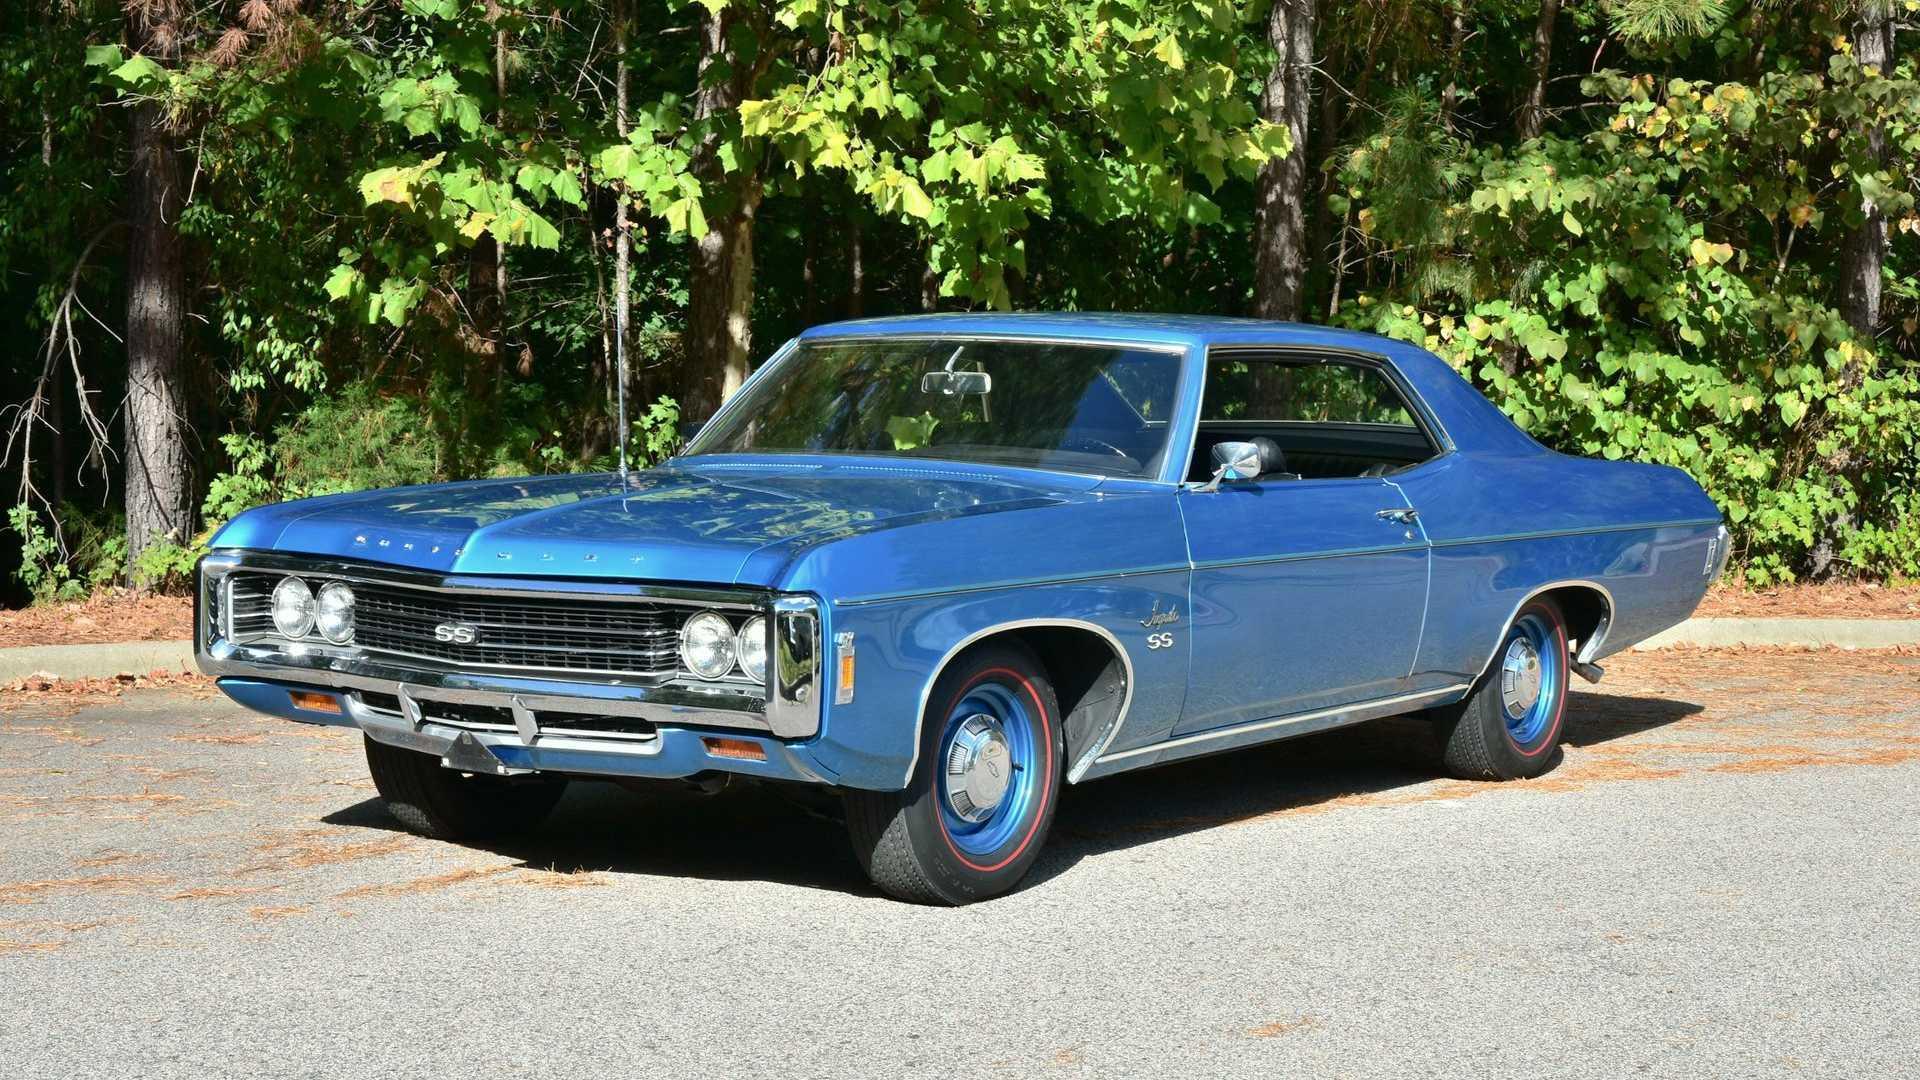 Kekurangan Chevrolet Impala 1969 Review